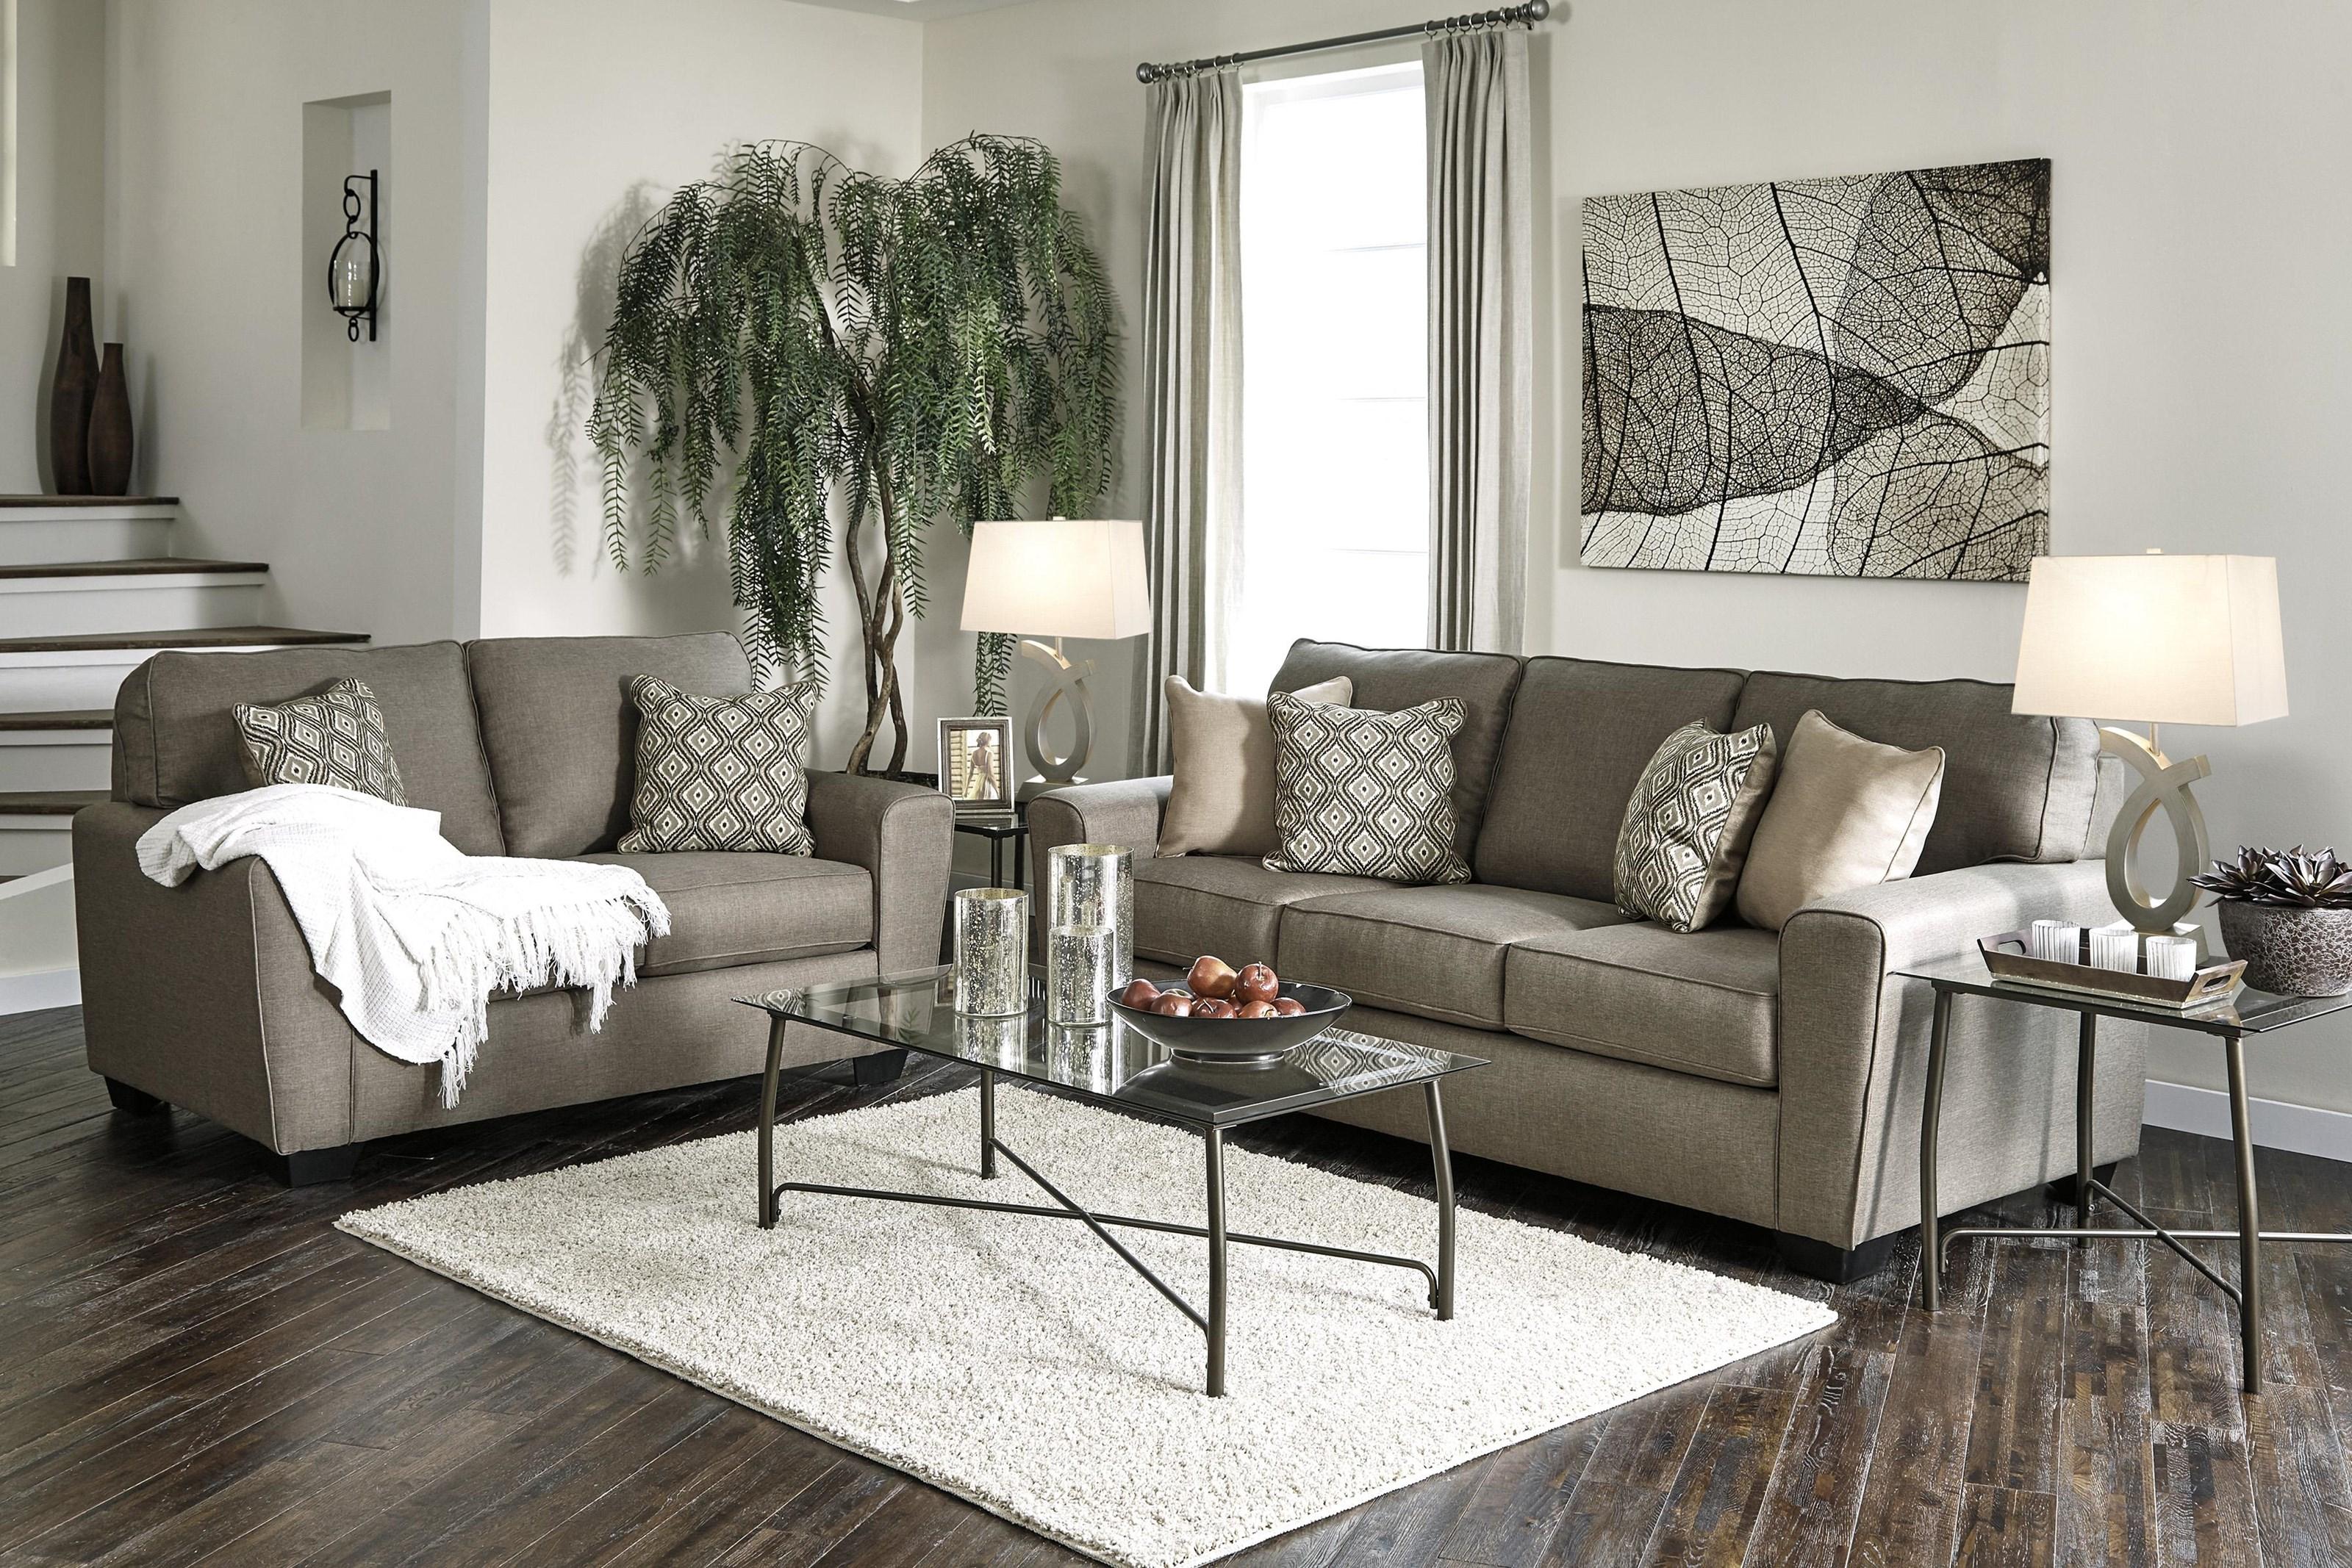 Benchcraft calicho calicho 8 pc lr 8 piece living room set - 8 piece living room furniture set ...